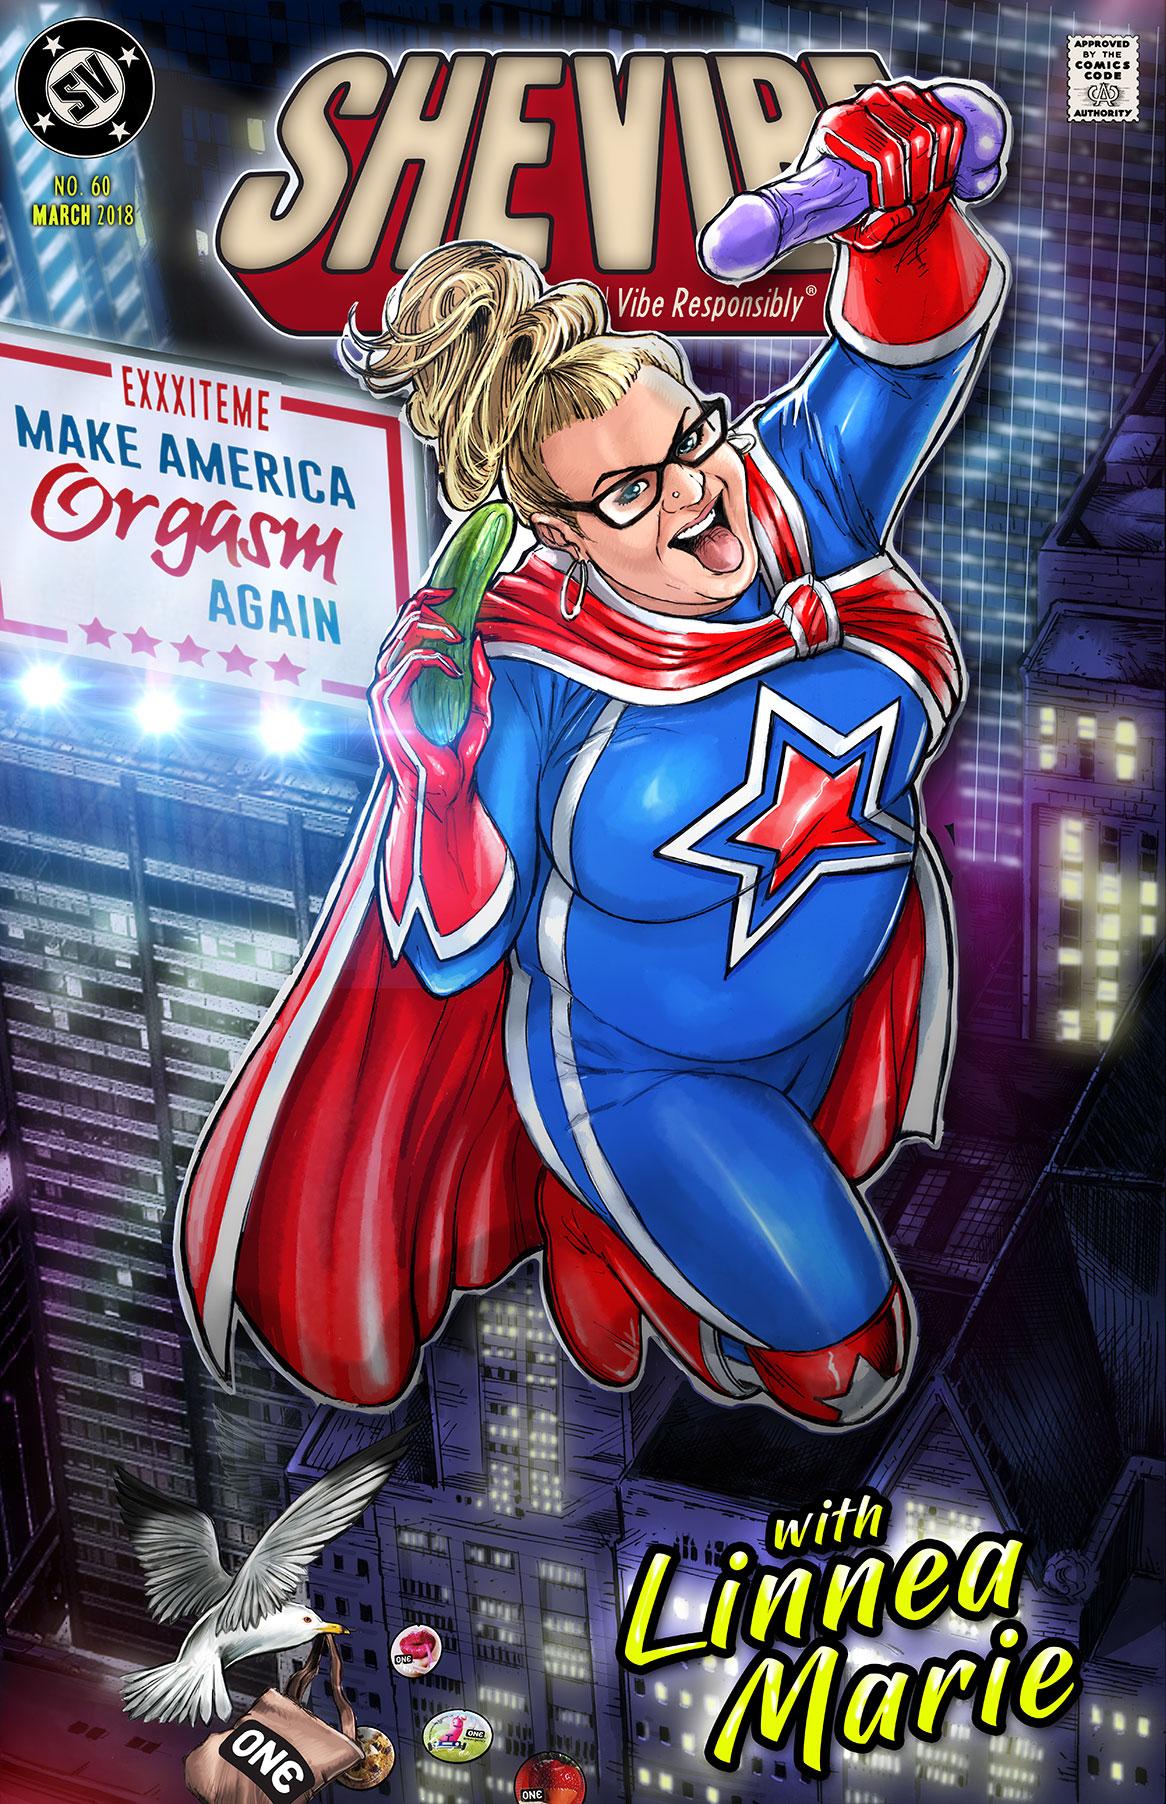 SheVibe Feature: Make America Orgasm Again - With Linnea Marie